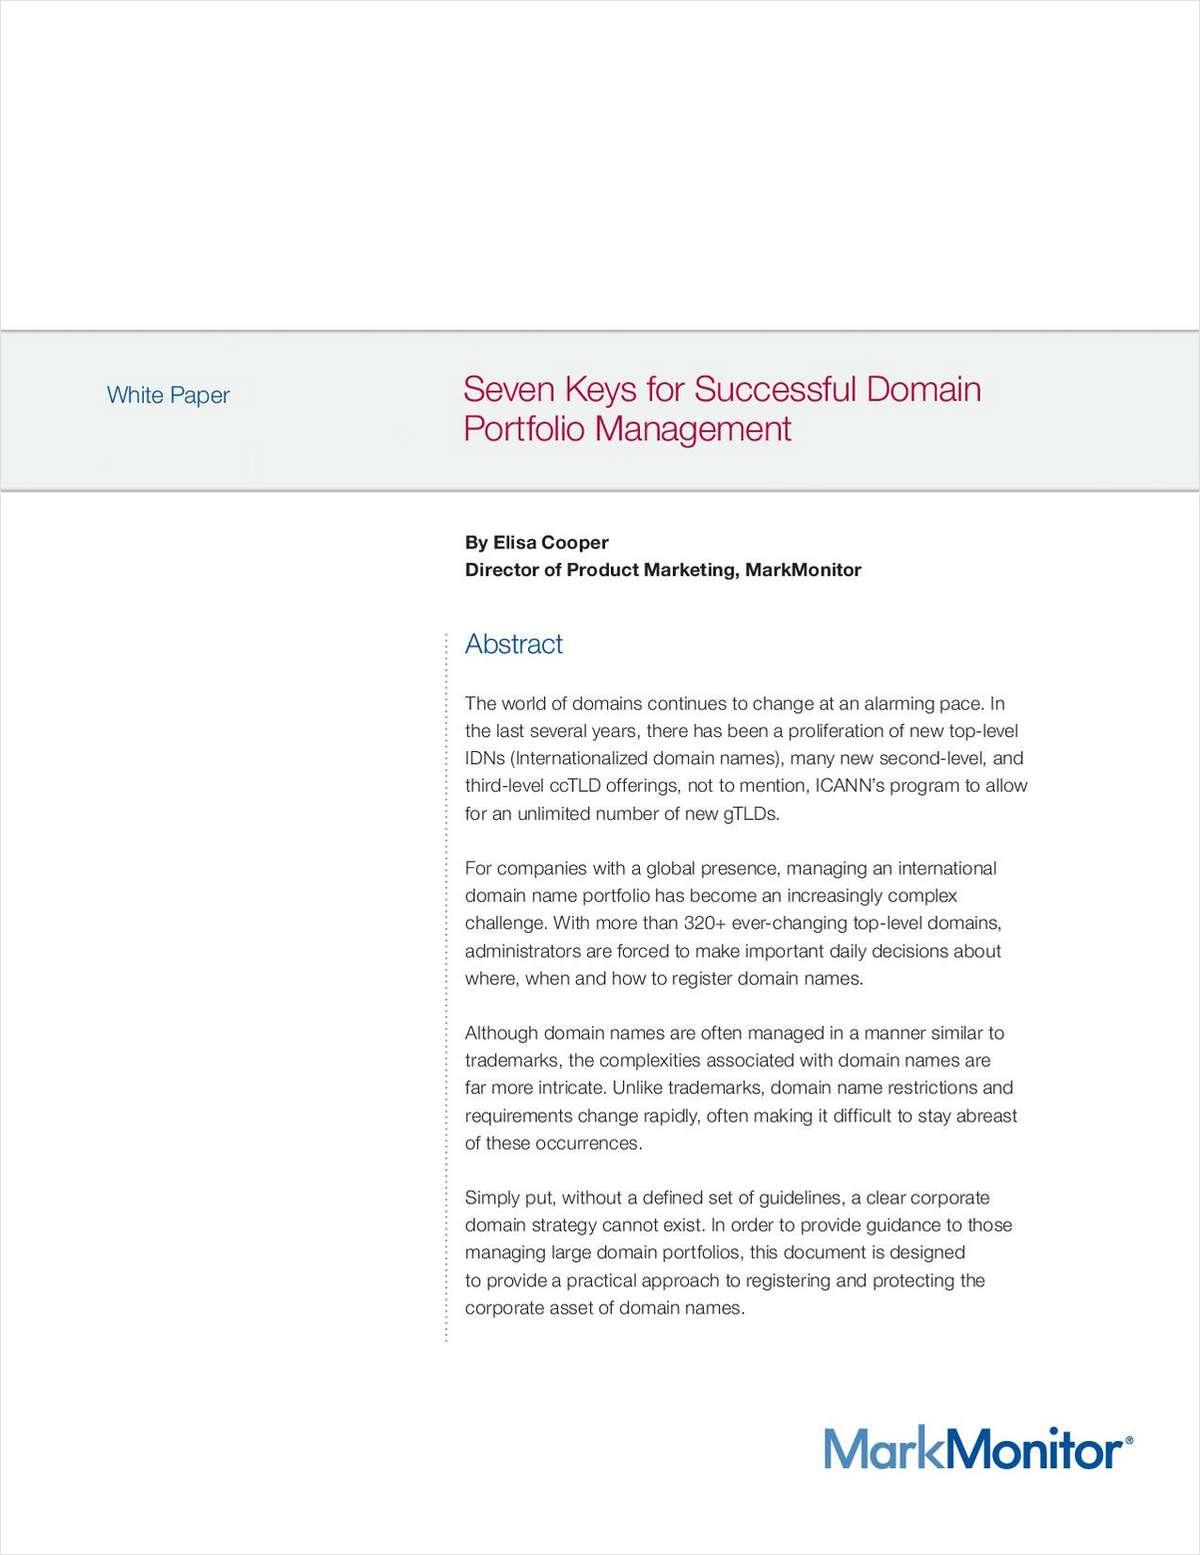 Seven Keys to Successful Domain Portfolio Management